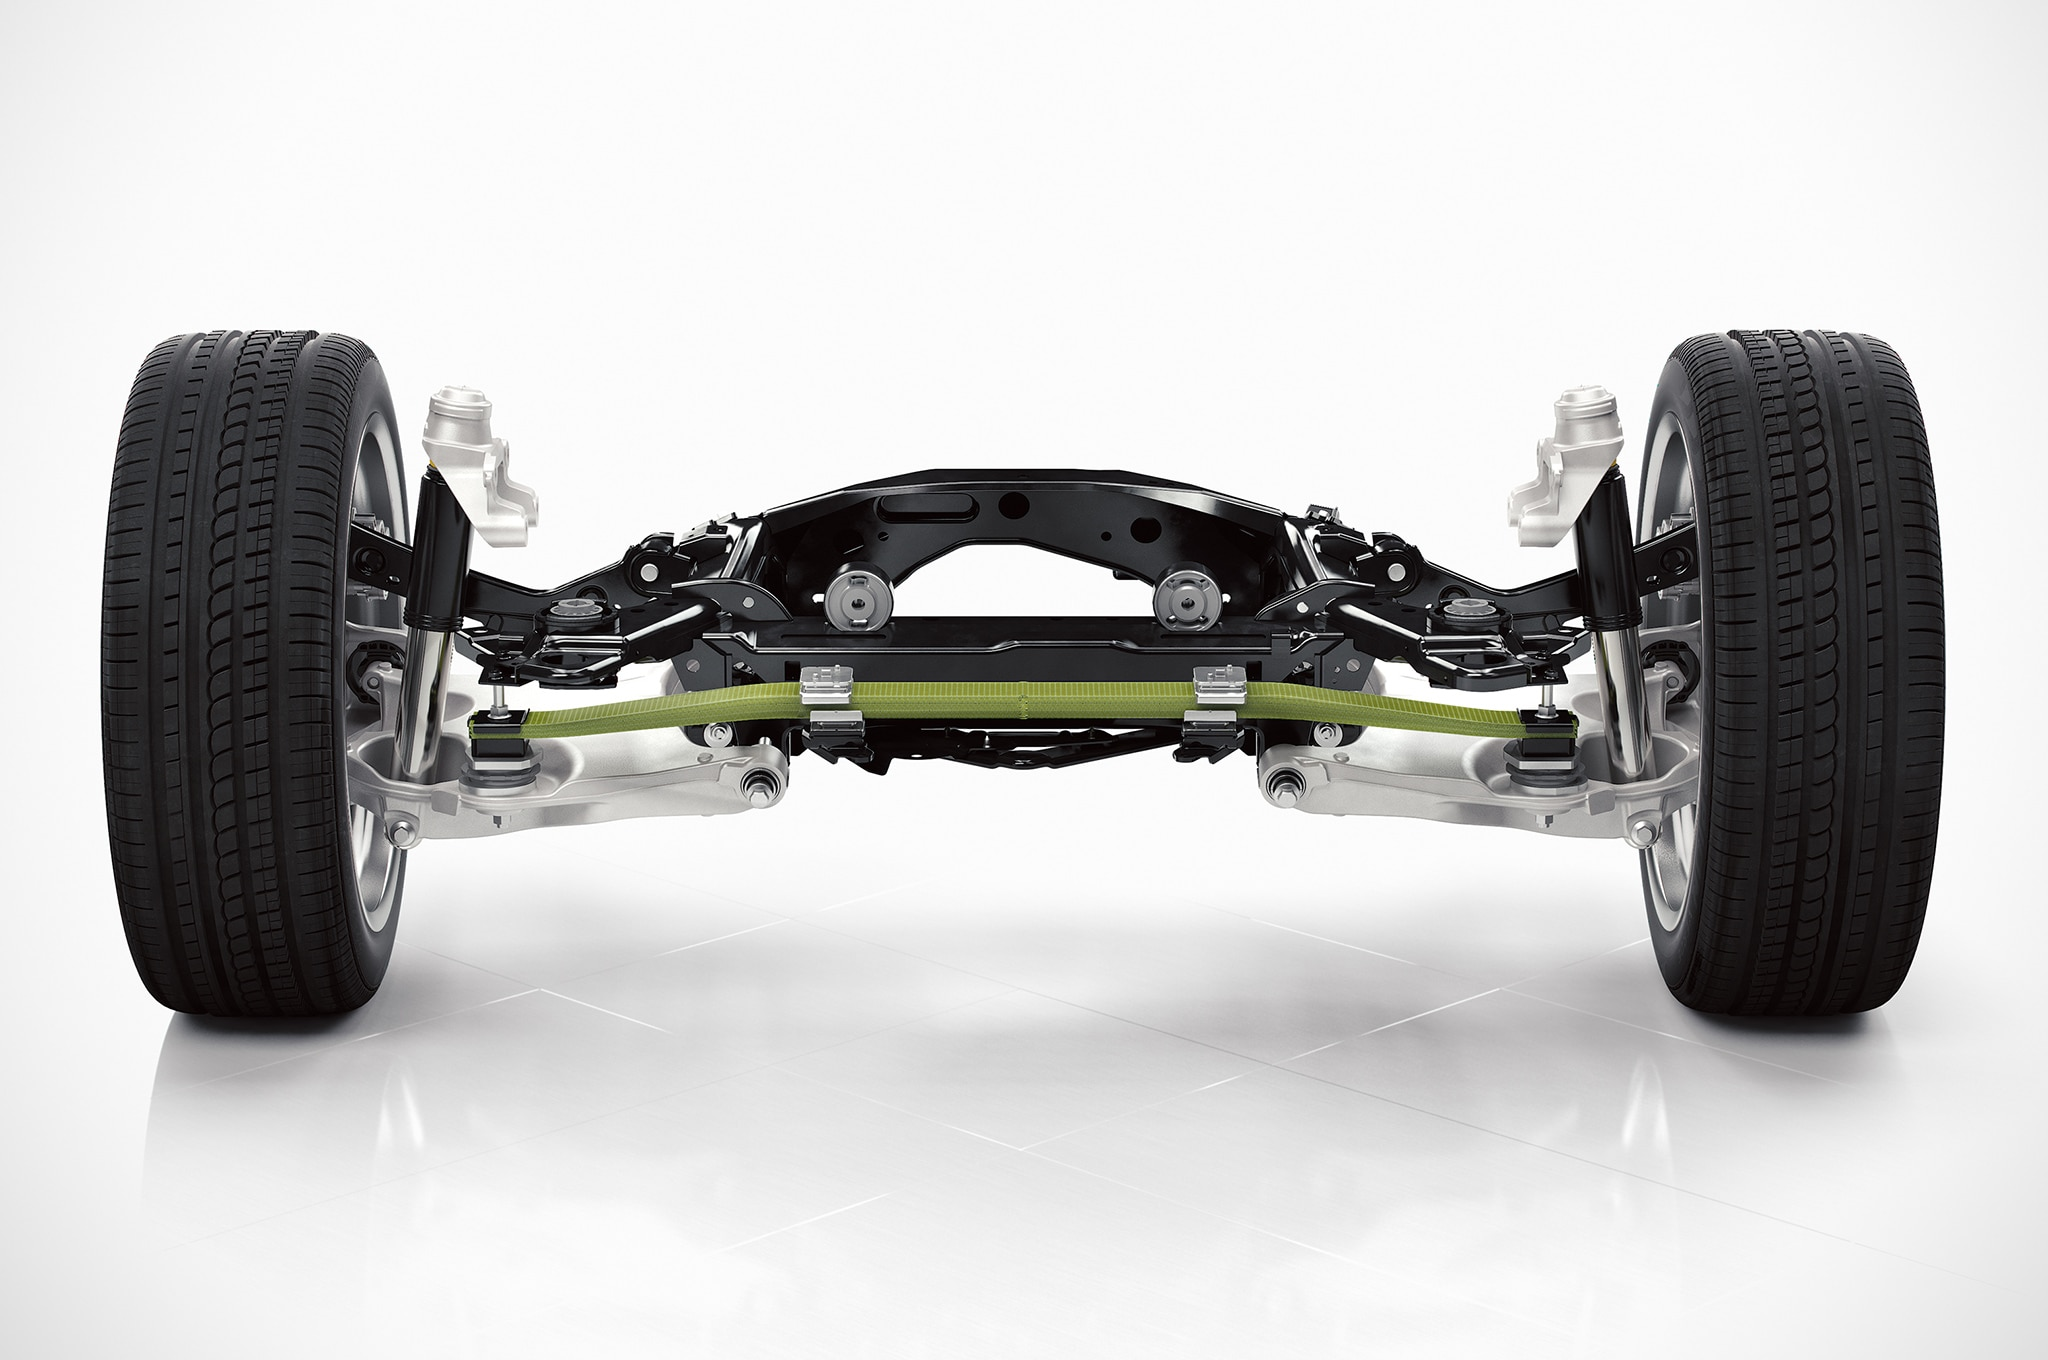 Volvo SPA Chassis Rear Suspension Diagram